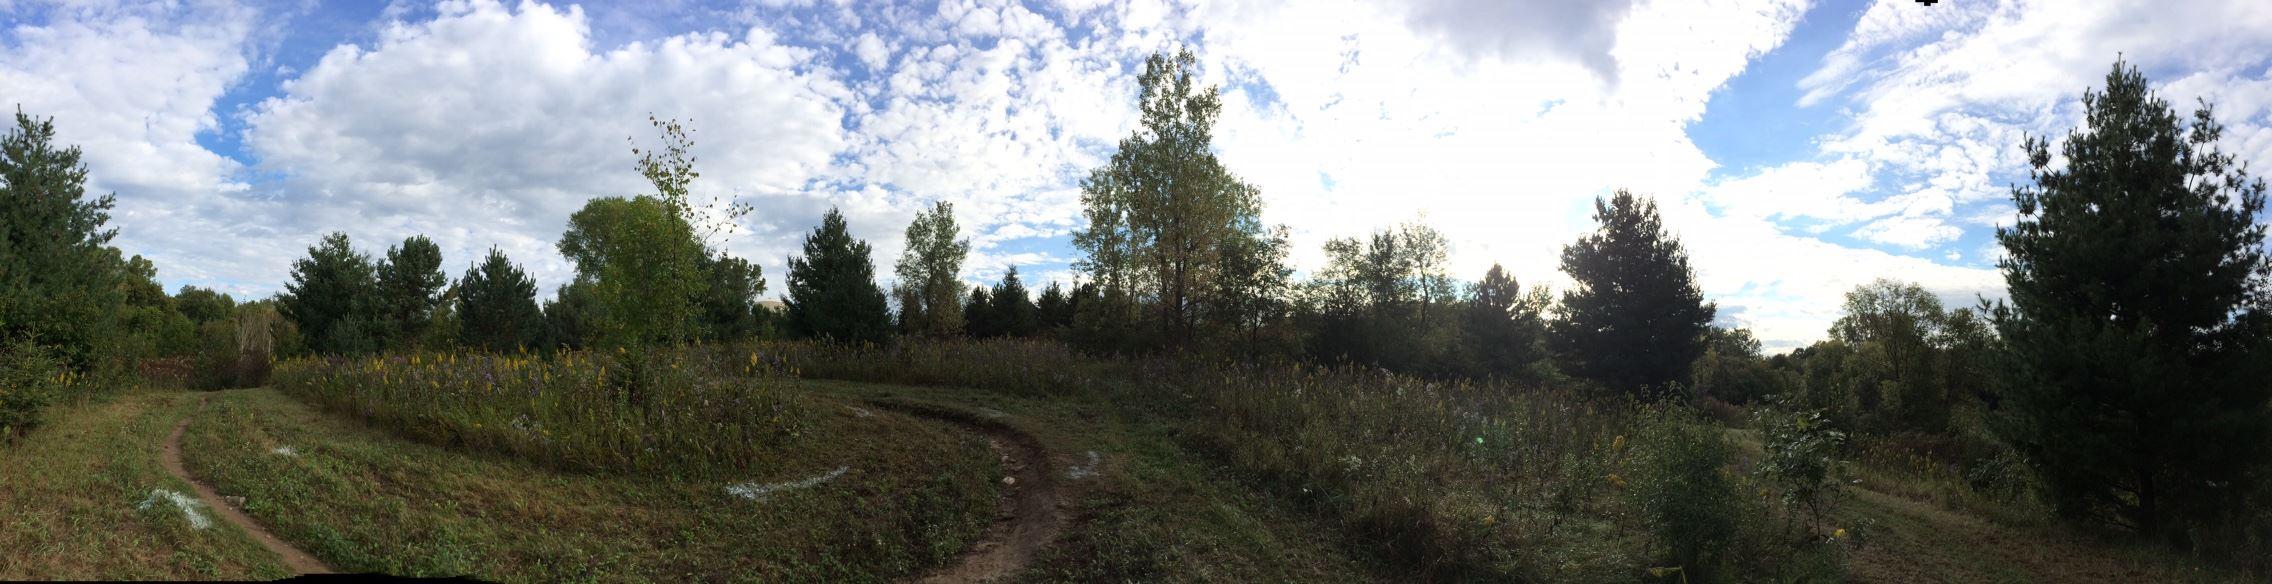 Harmon Park Reserve